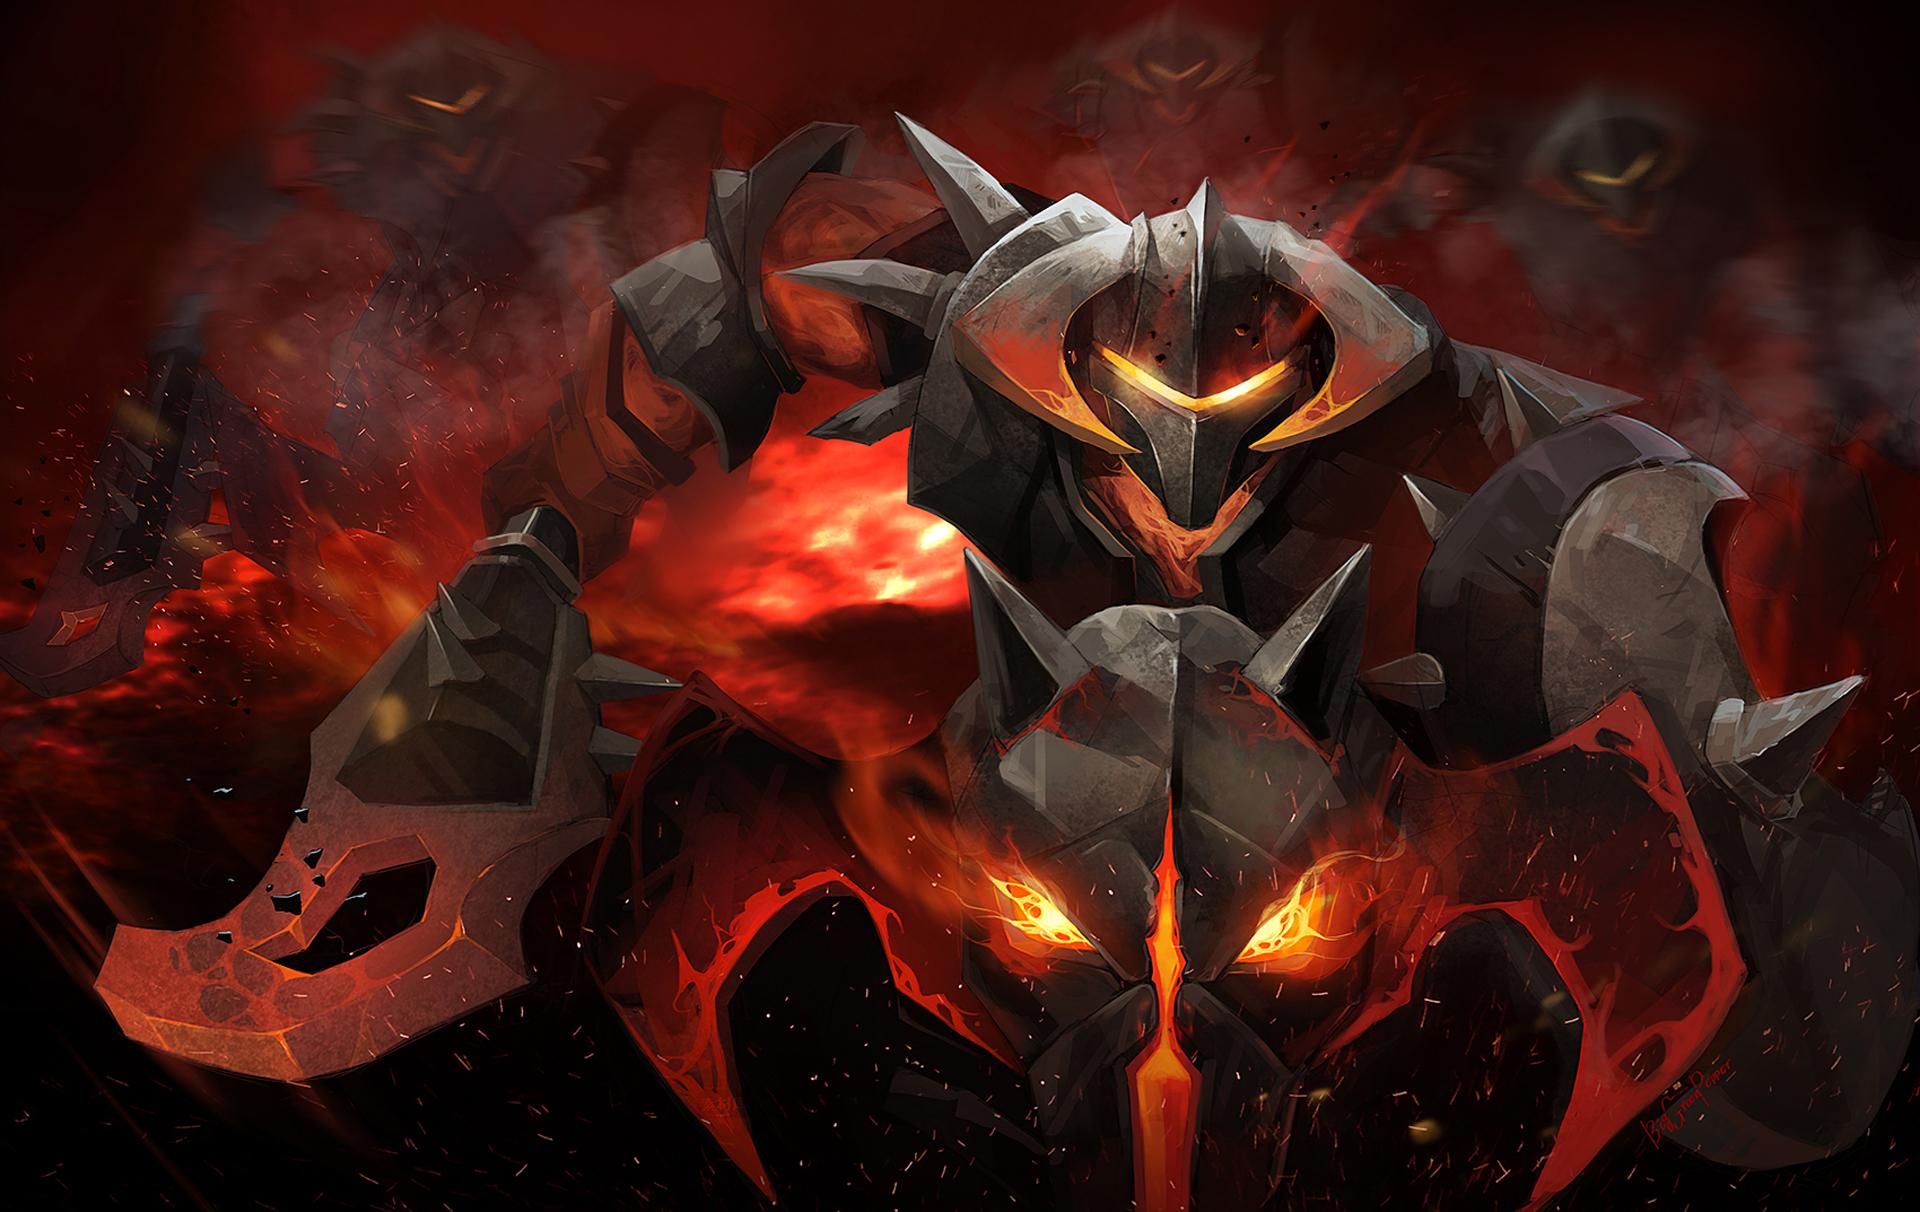 DOTA 2 Warriors Chaos Knight Armor Games Fantasy warrior demon 1920x1212